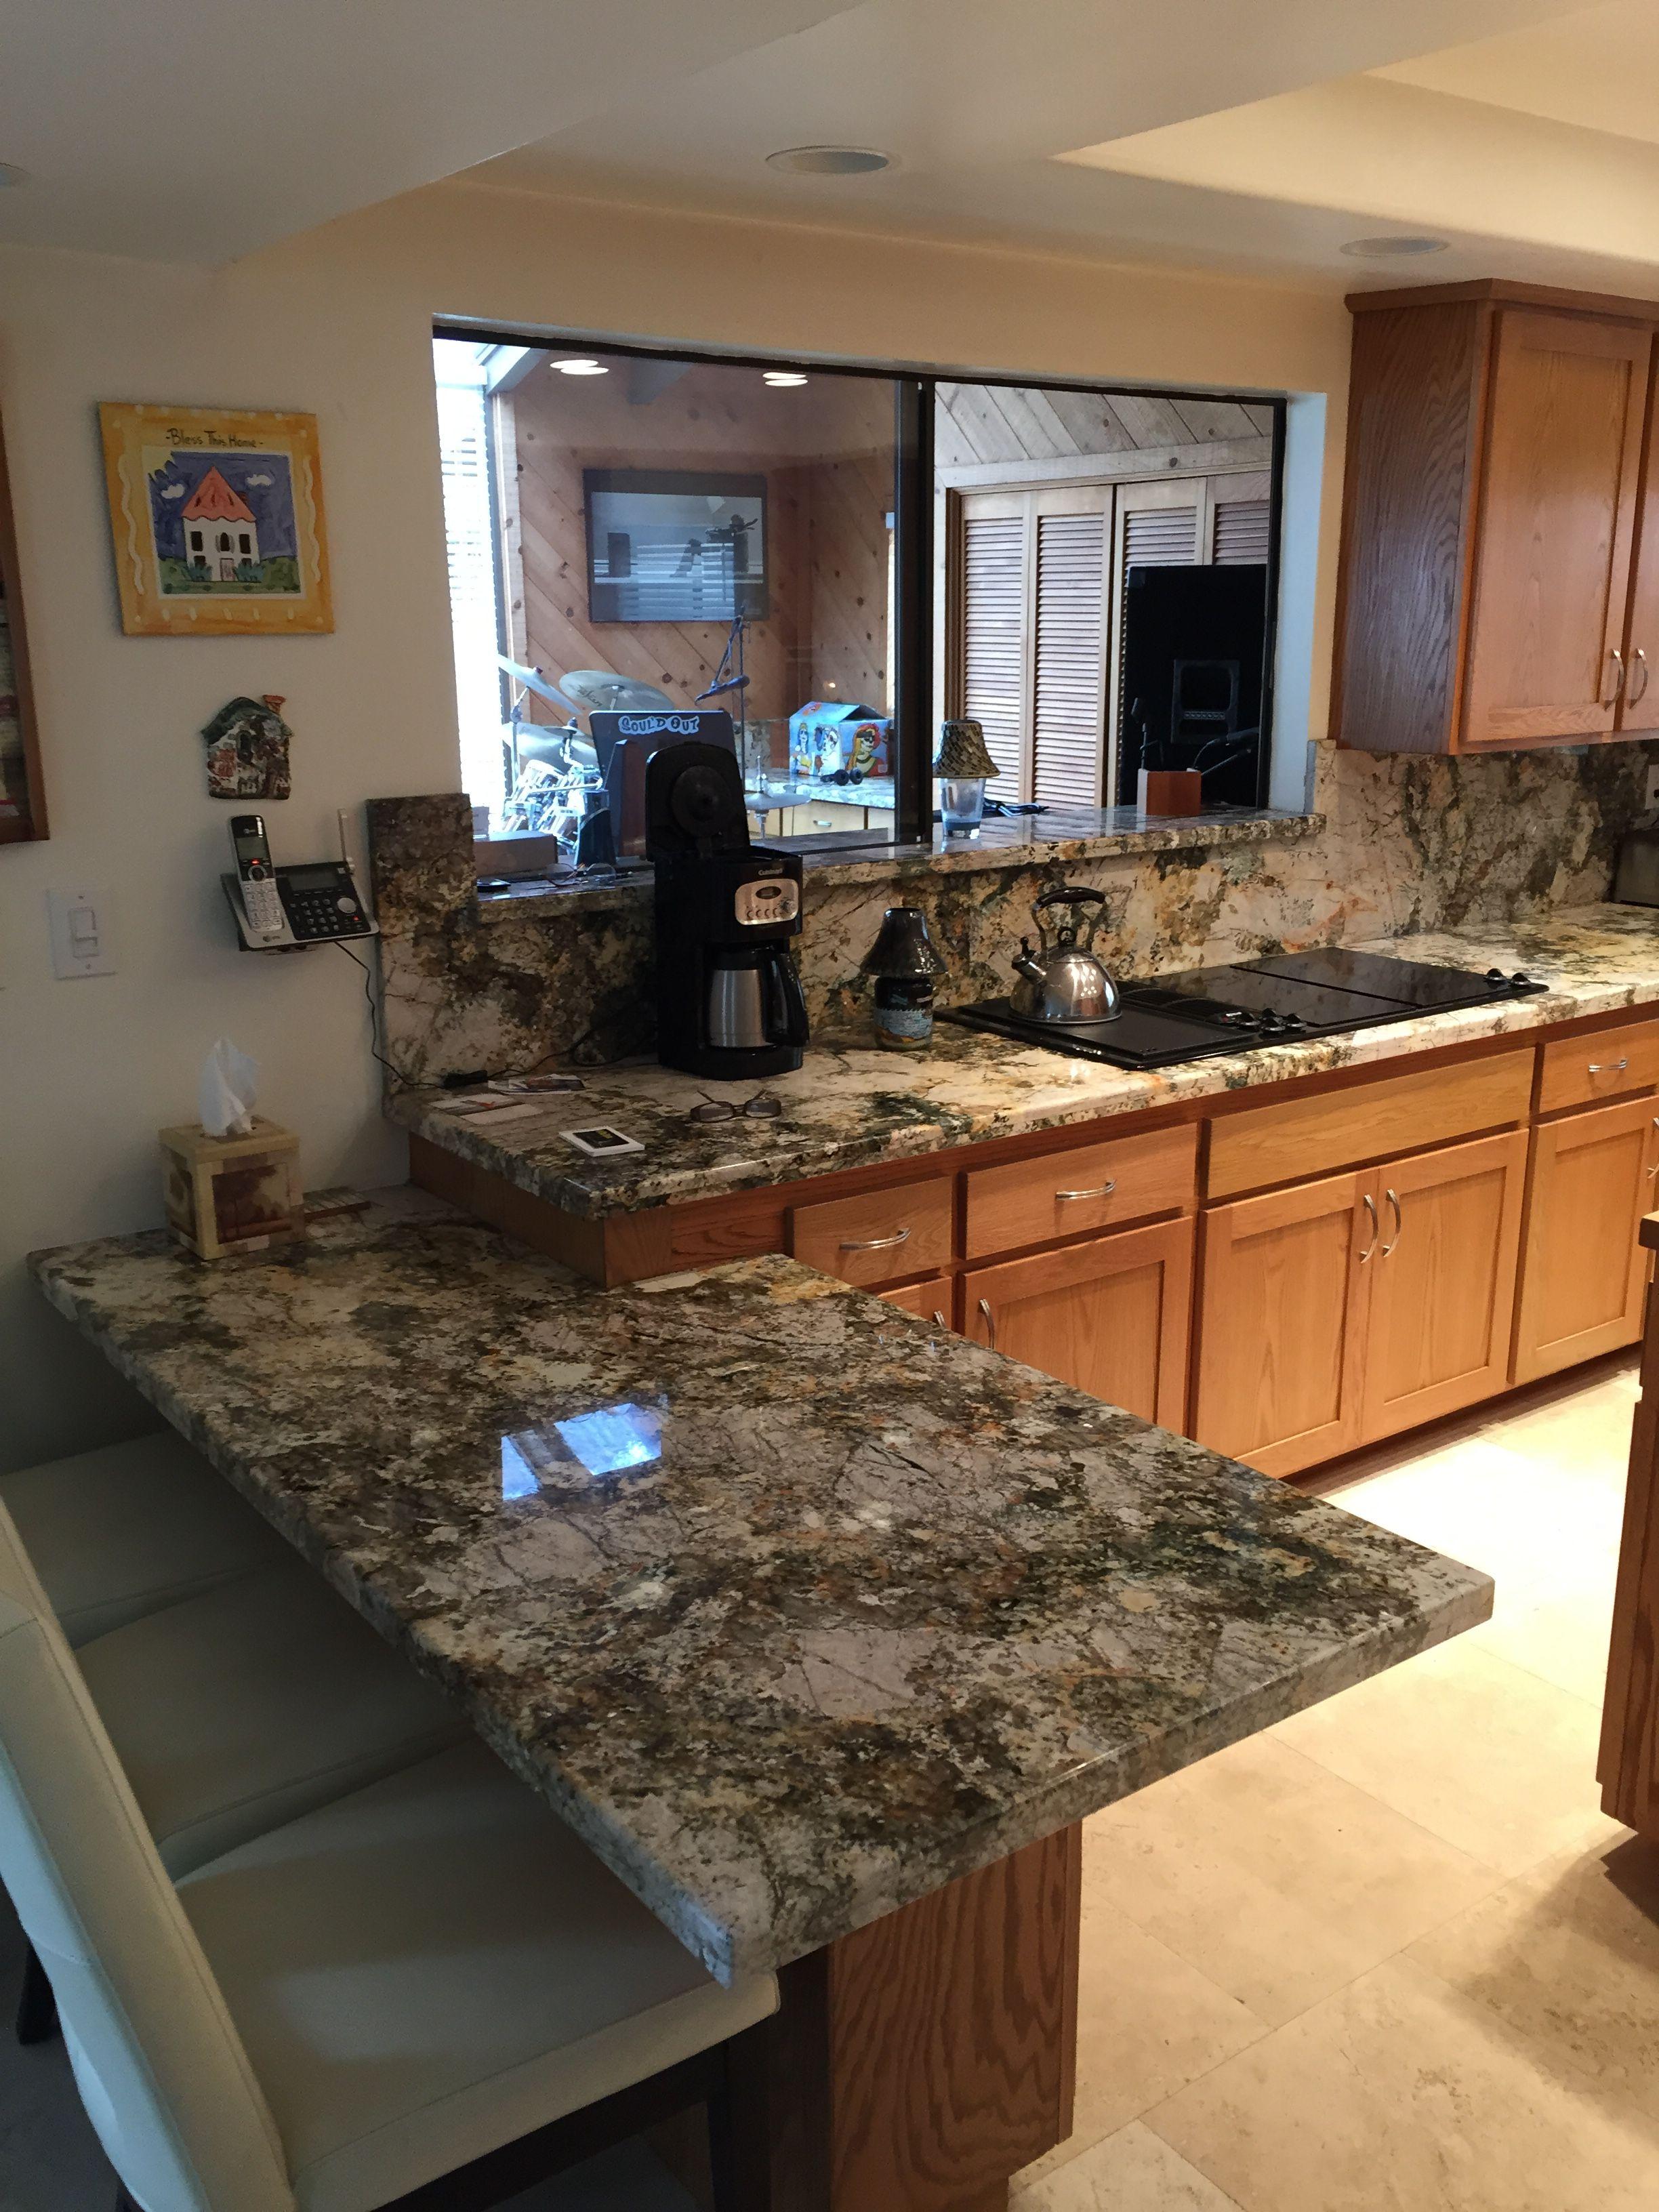 Barricato granite counter top and full backsplash (With ... on Best Backsplash For Granite Countertops  id=87557